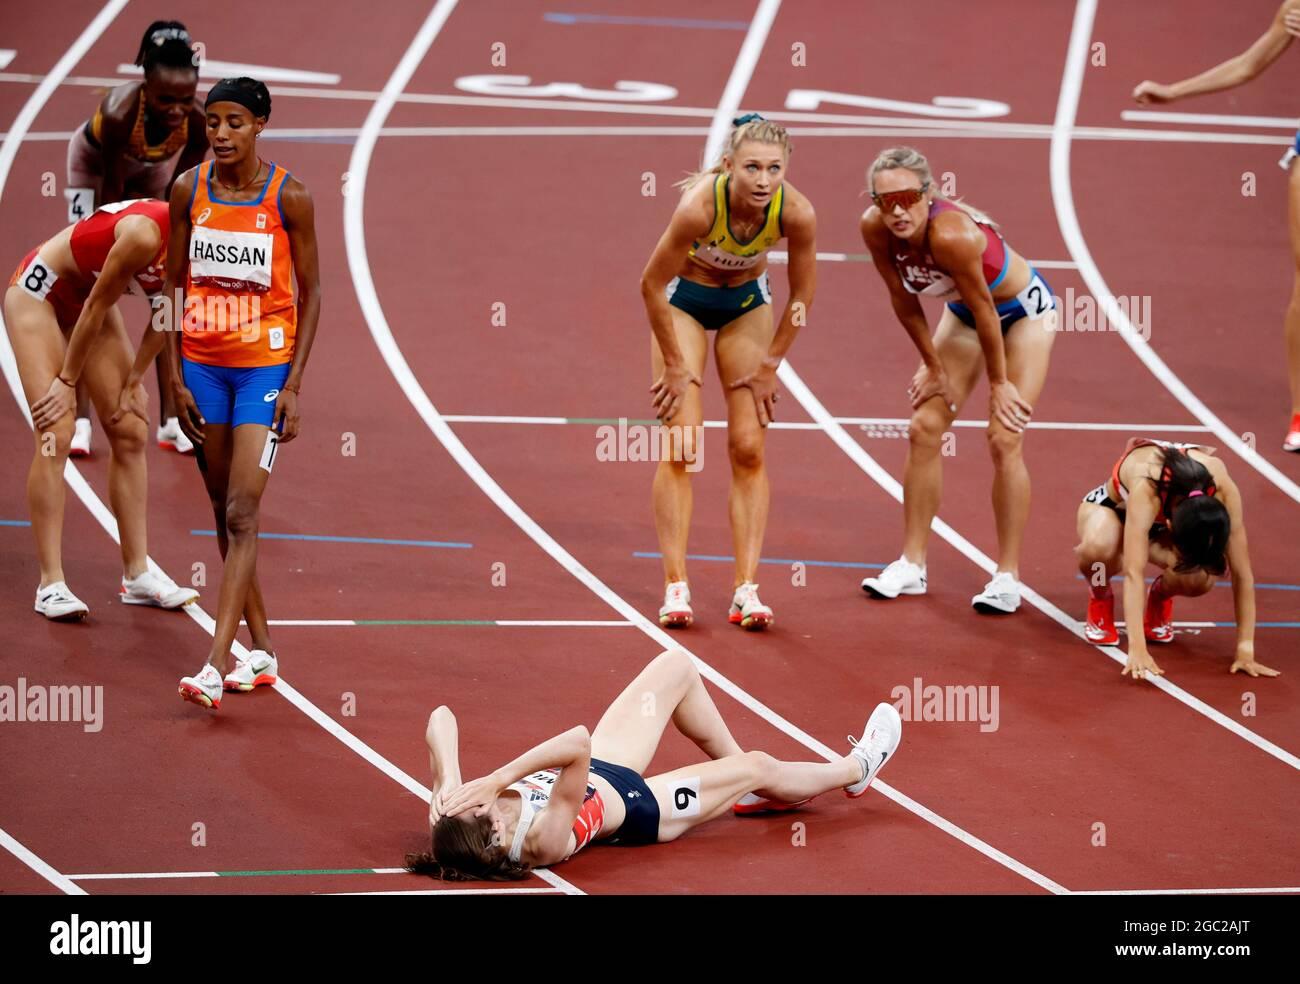 Tokyo 2020 Olimpiadi - Atletica - Donne 1500m - finale - Stadio Olimpico, Tokyo, Giappone - 6 agosto 2021. Gli atleti riposano REUTERS/Phil Noble Foto Stock